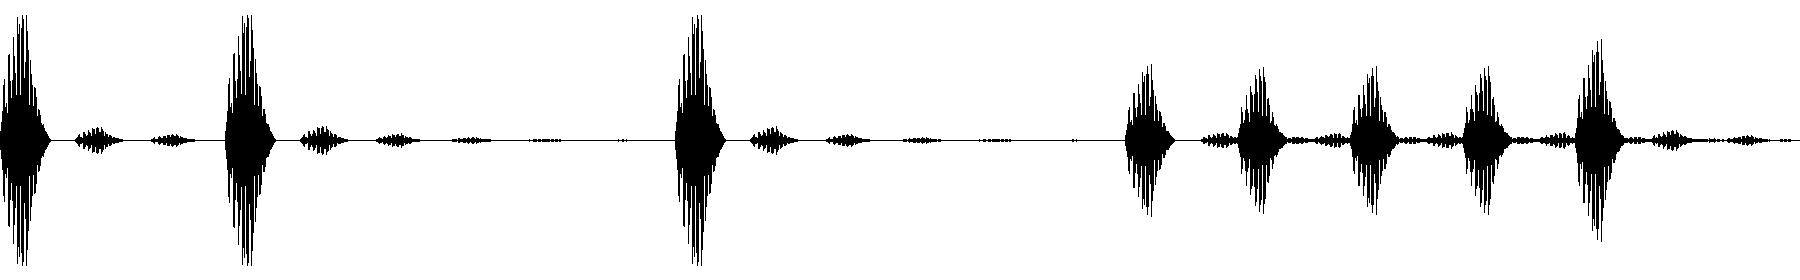 vocal snippit 05140bpm